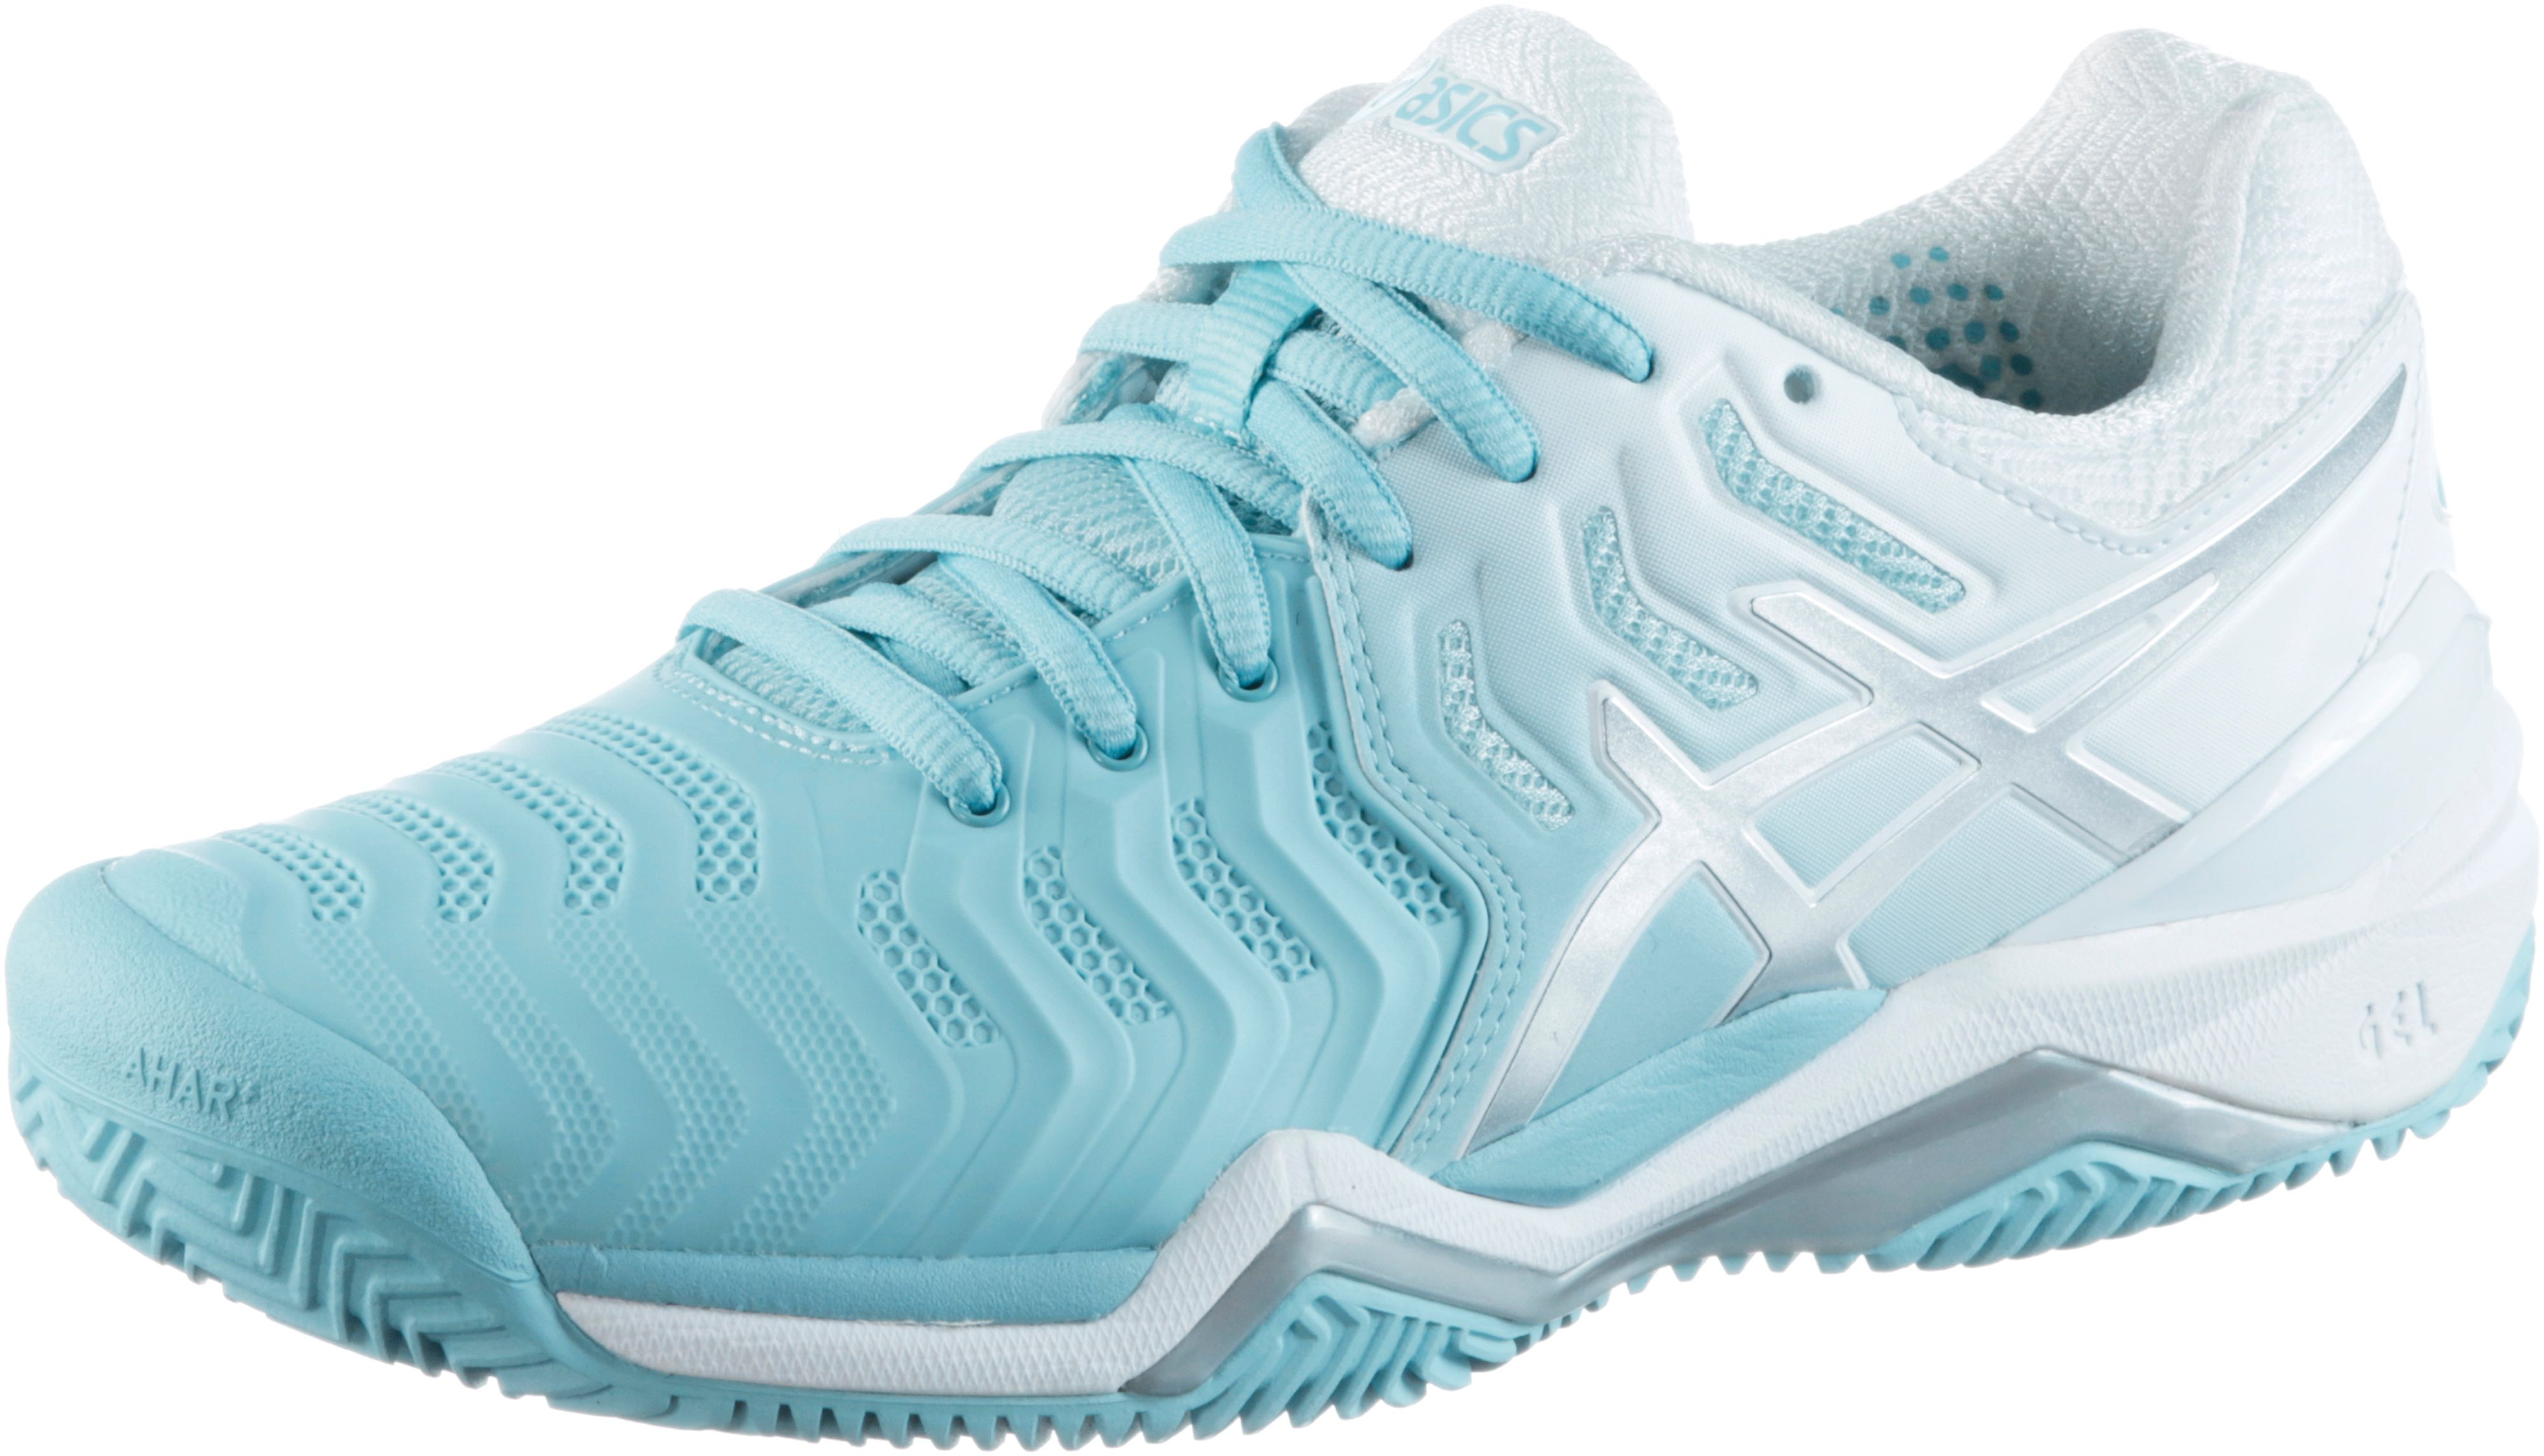 adidas aspire Tennisschuhe Damen, ftwr white,Größen: 37 1/3, 38 2/3, 38, 39 1/3, 40, 40 2/3, 41 1/3, 42